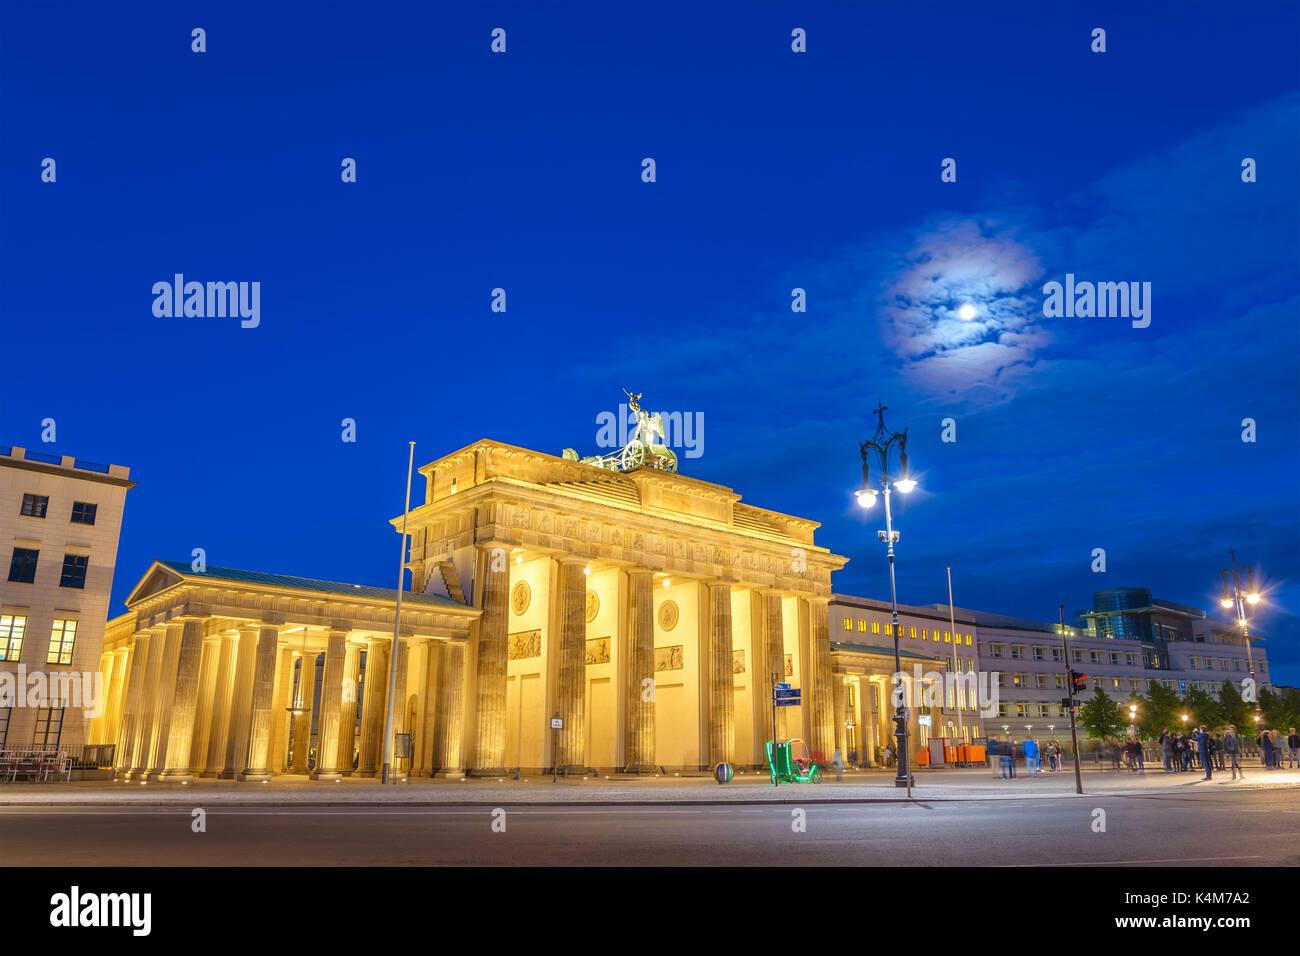 Berlin Night Skyline am Brandenburger Tor (Brandenburger Tor), Berlin, Deutschland Stockbild